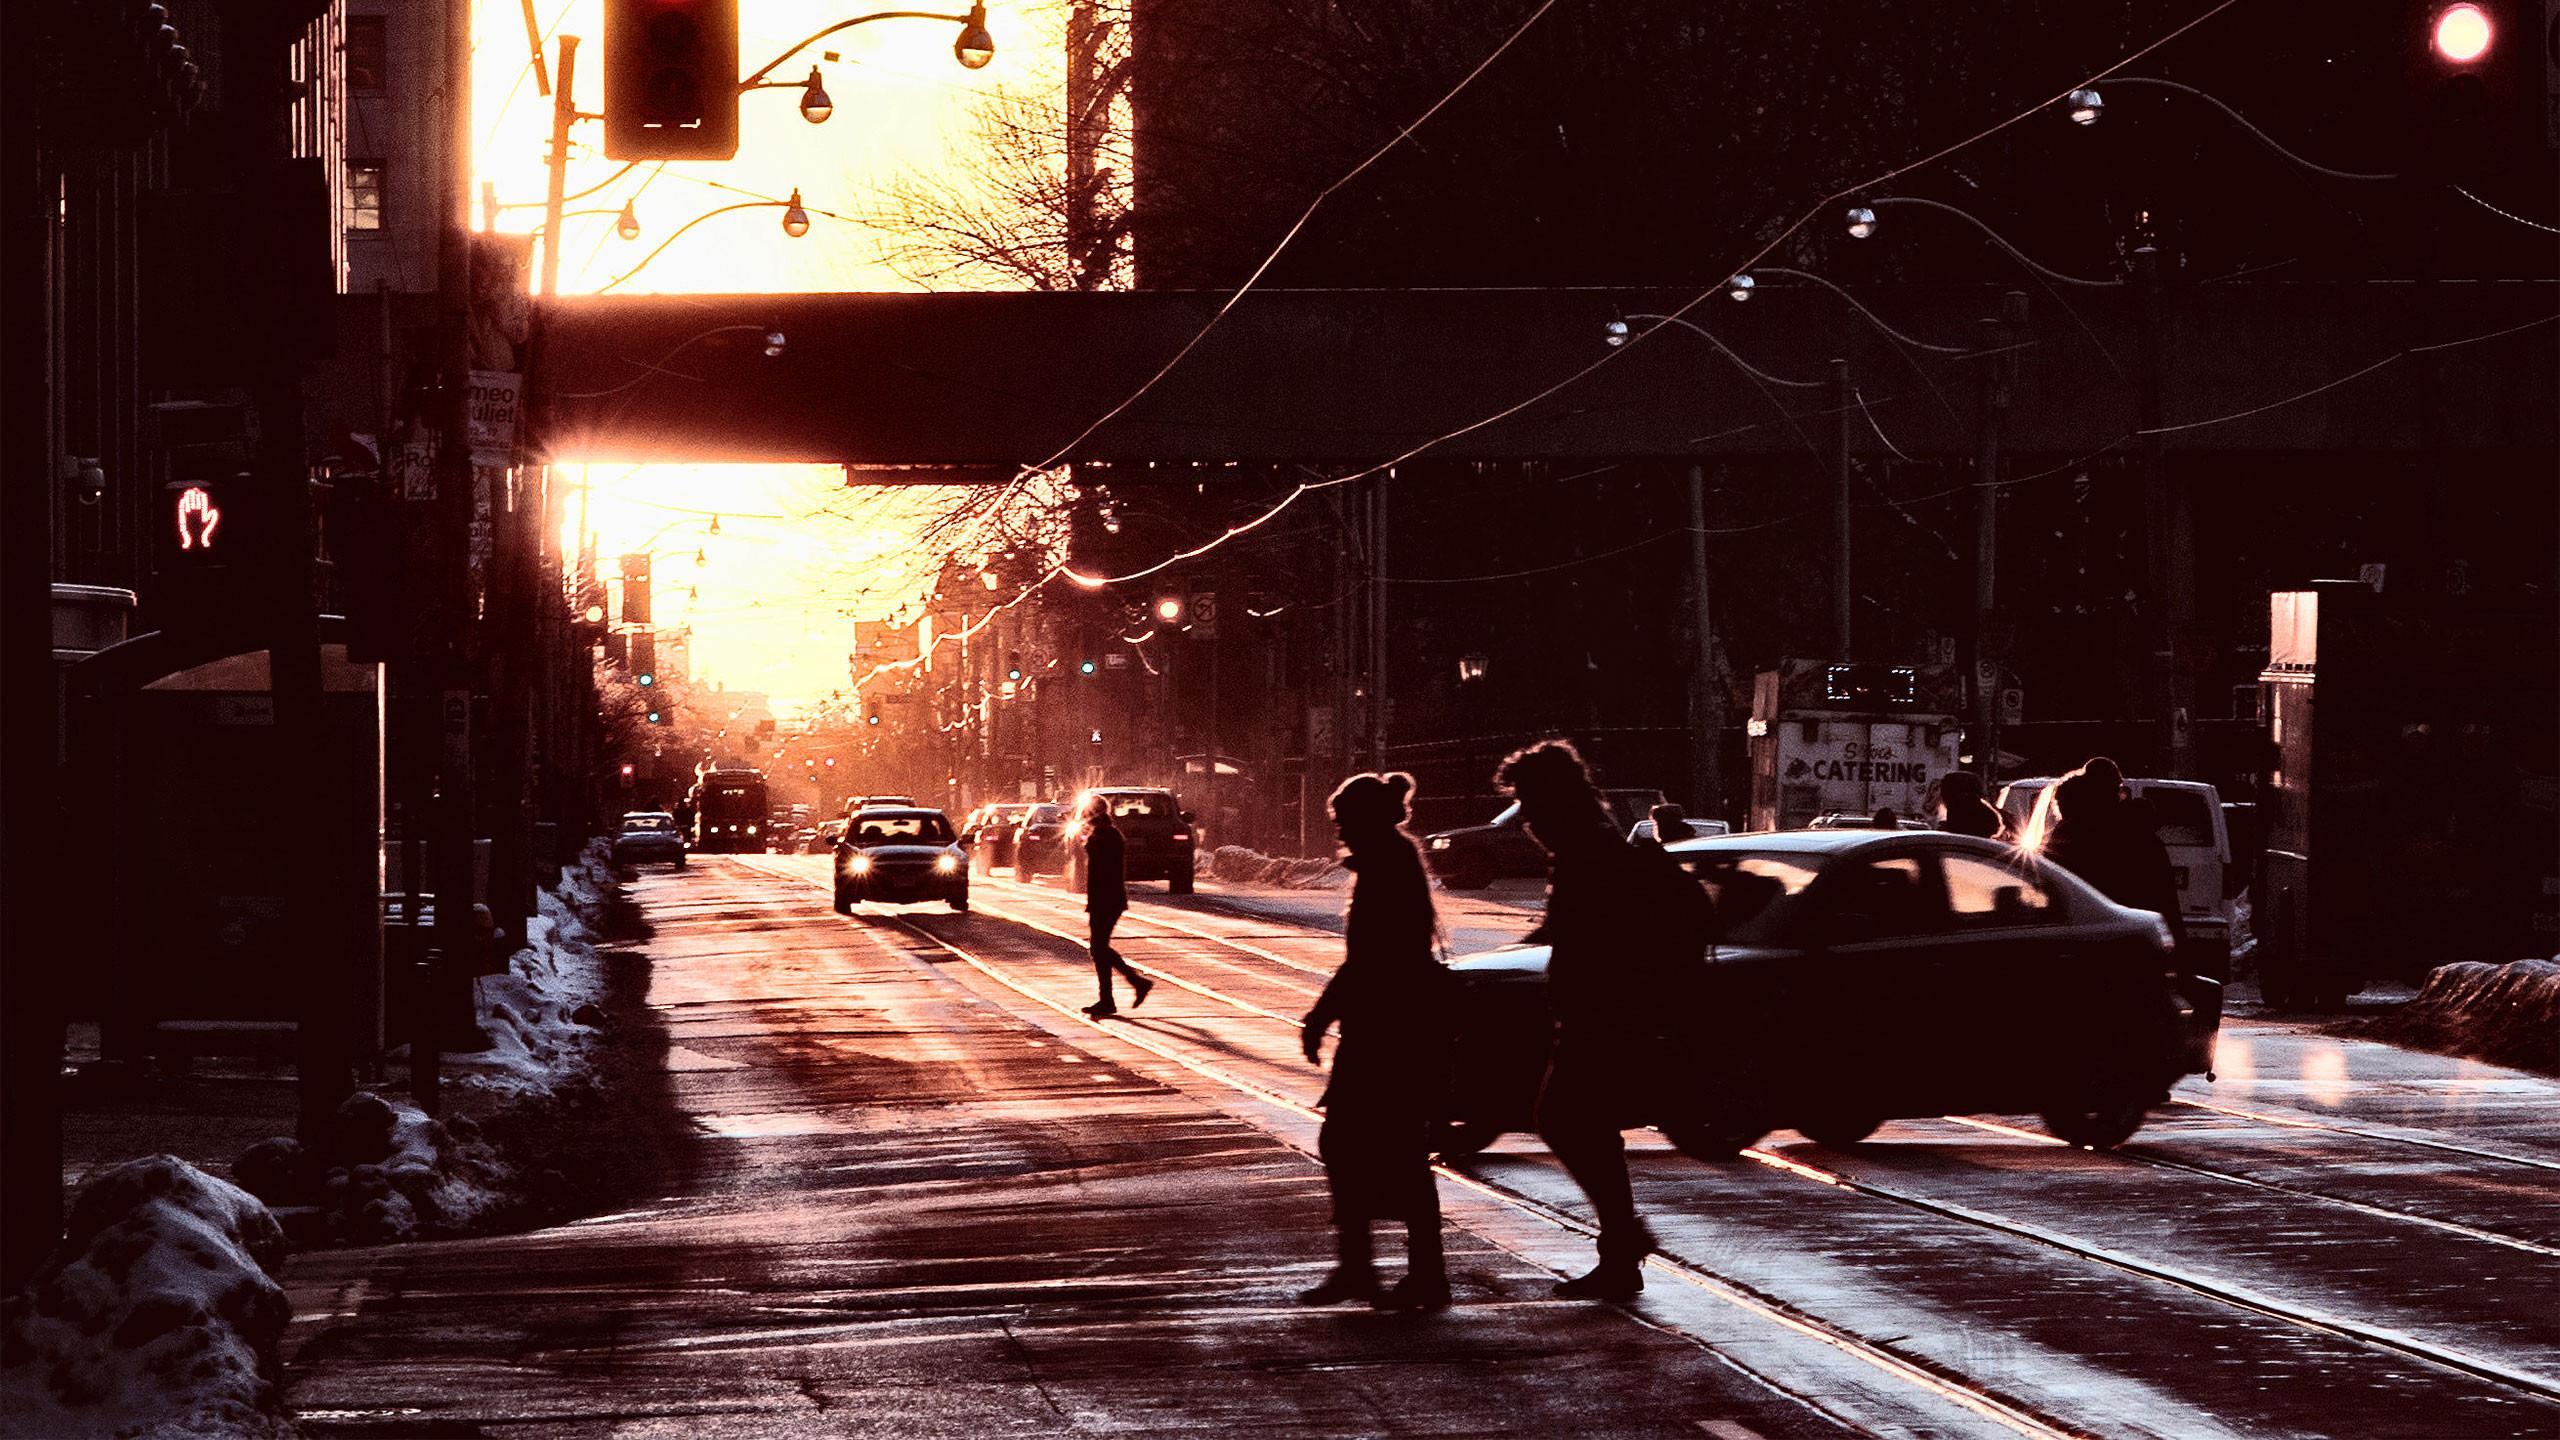 "<p><span>Фото: &copy;</span> <span>Flickr/<a href=""https://www.flickr.com/photos/yakubovich/8484353370/"" target=""_blank"">Ilya Yakubovich</a></span></p>"